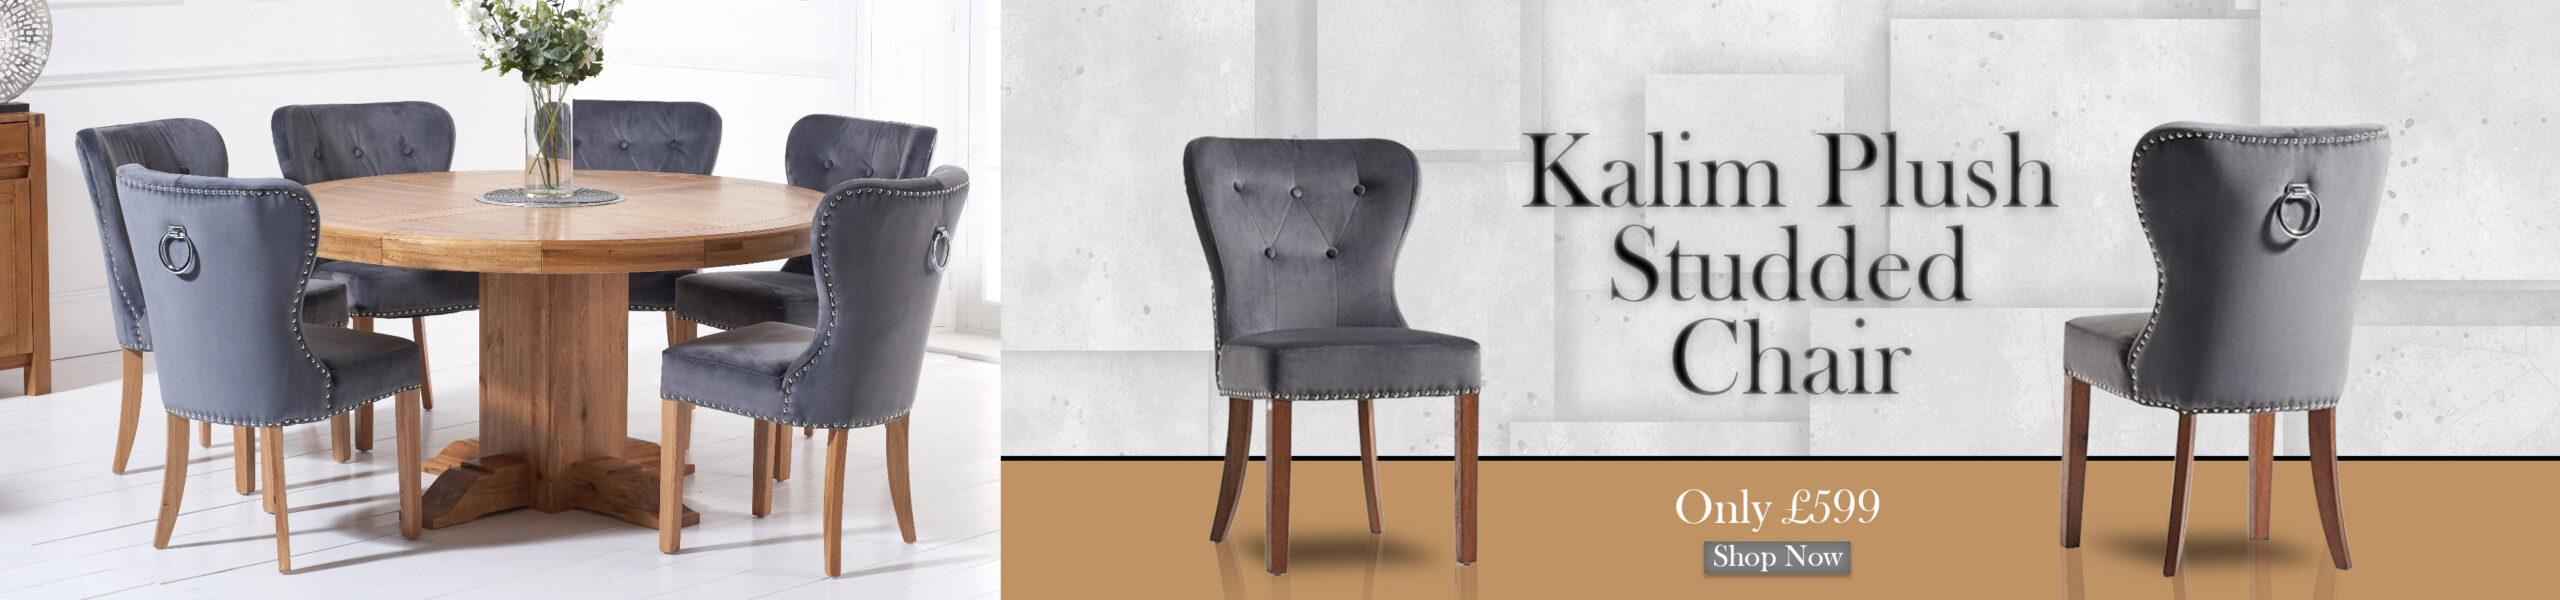 FADS Kalim Plush Studded Chair Banner